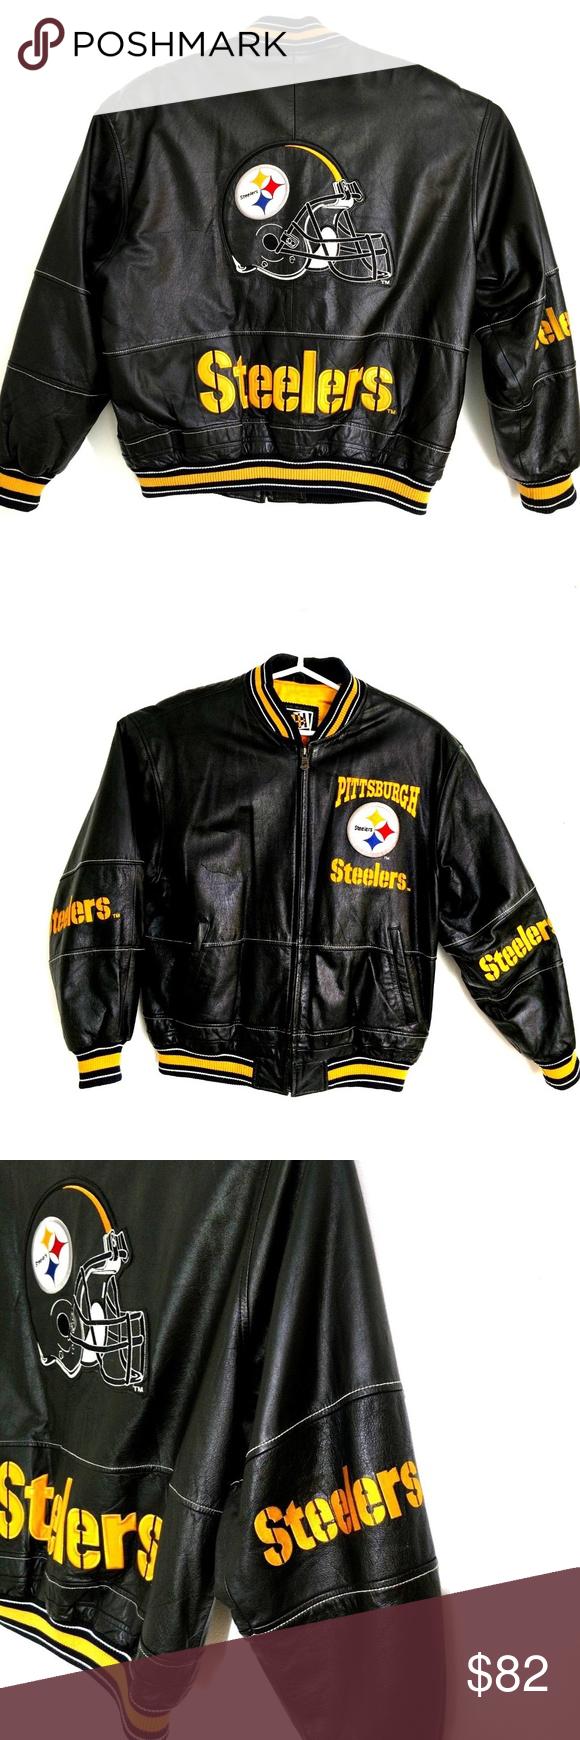 Vintage Pittsburg Steelers Leather Jacket Size L Mens